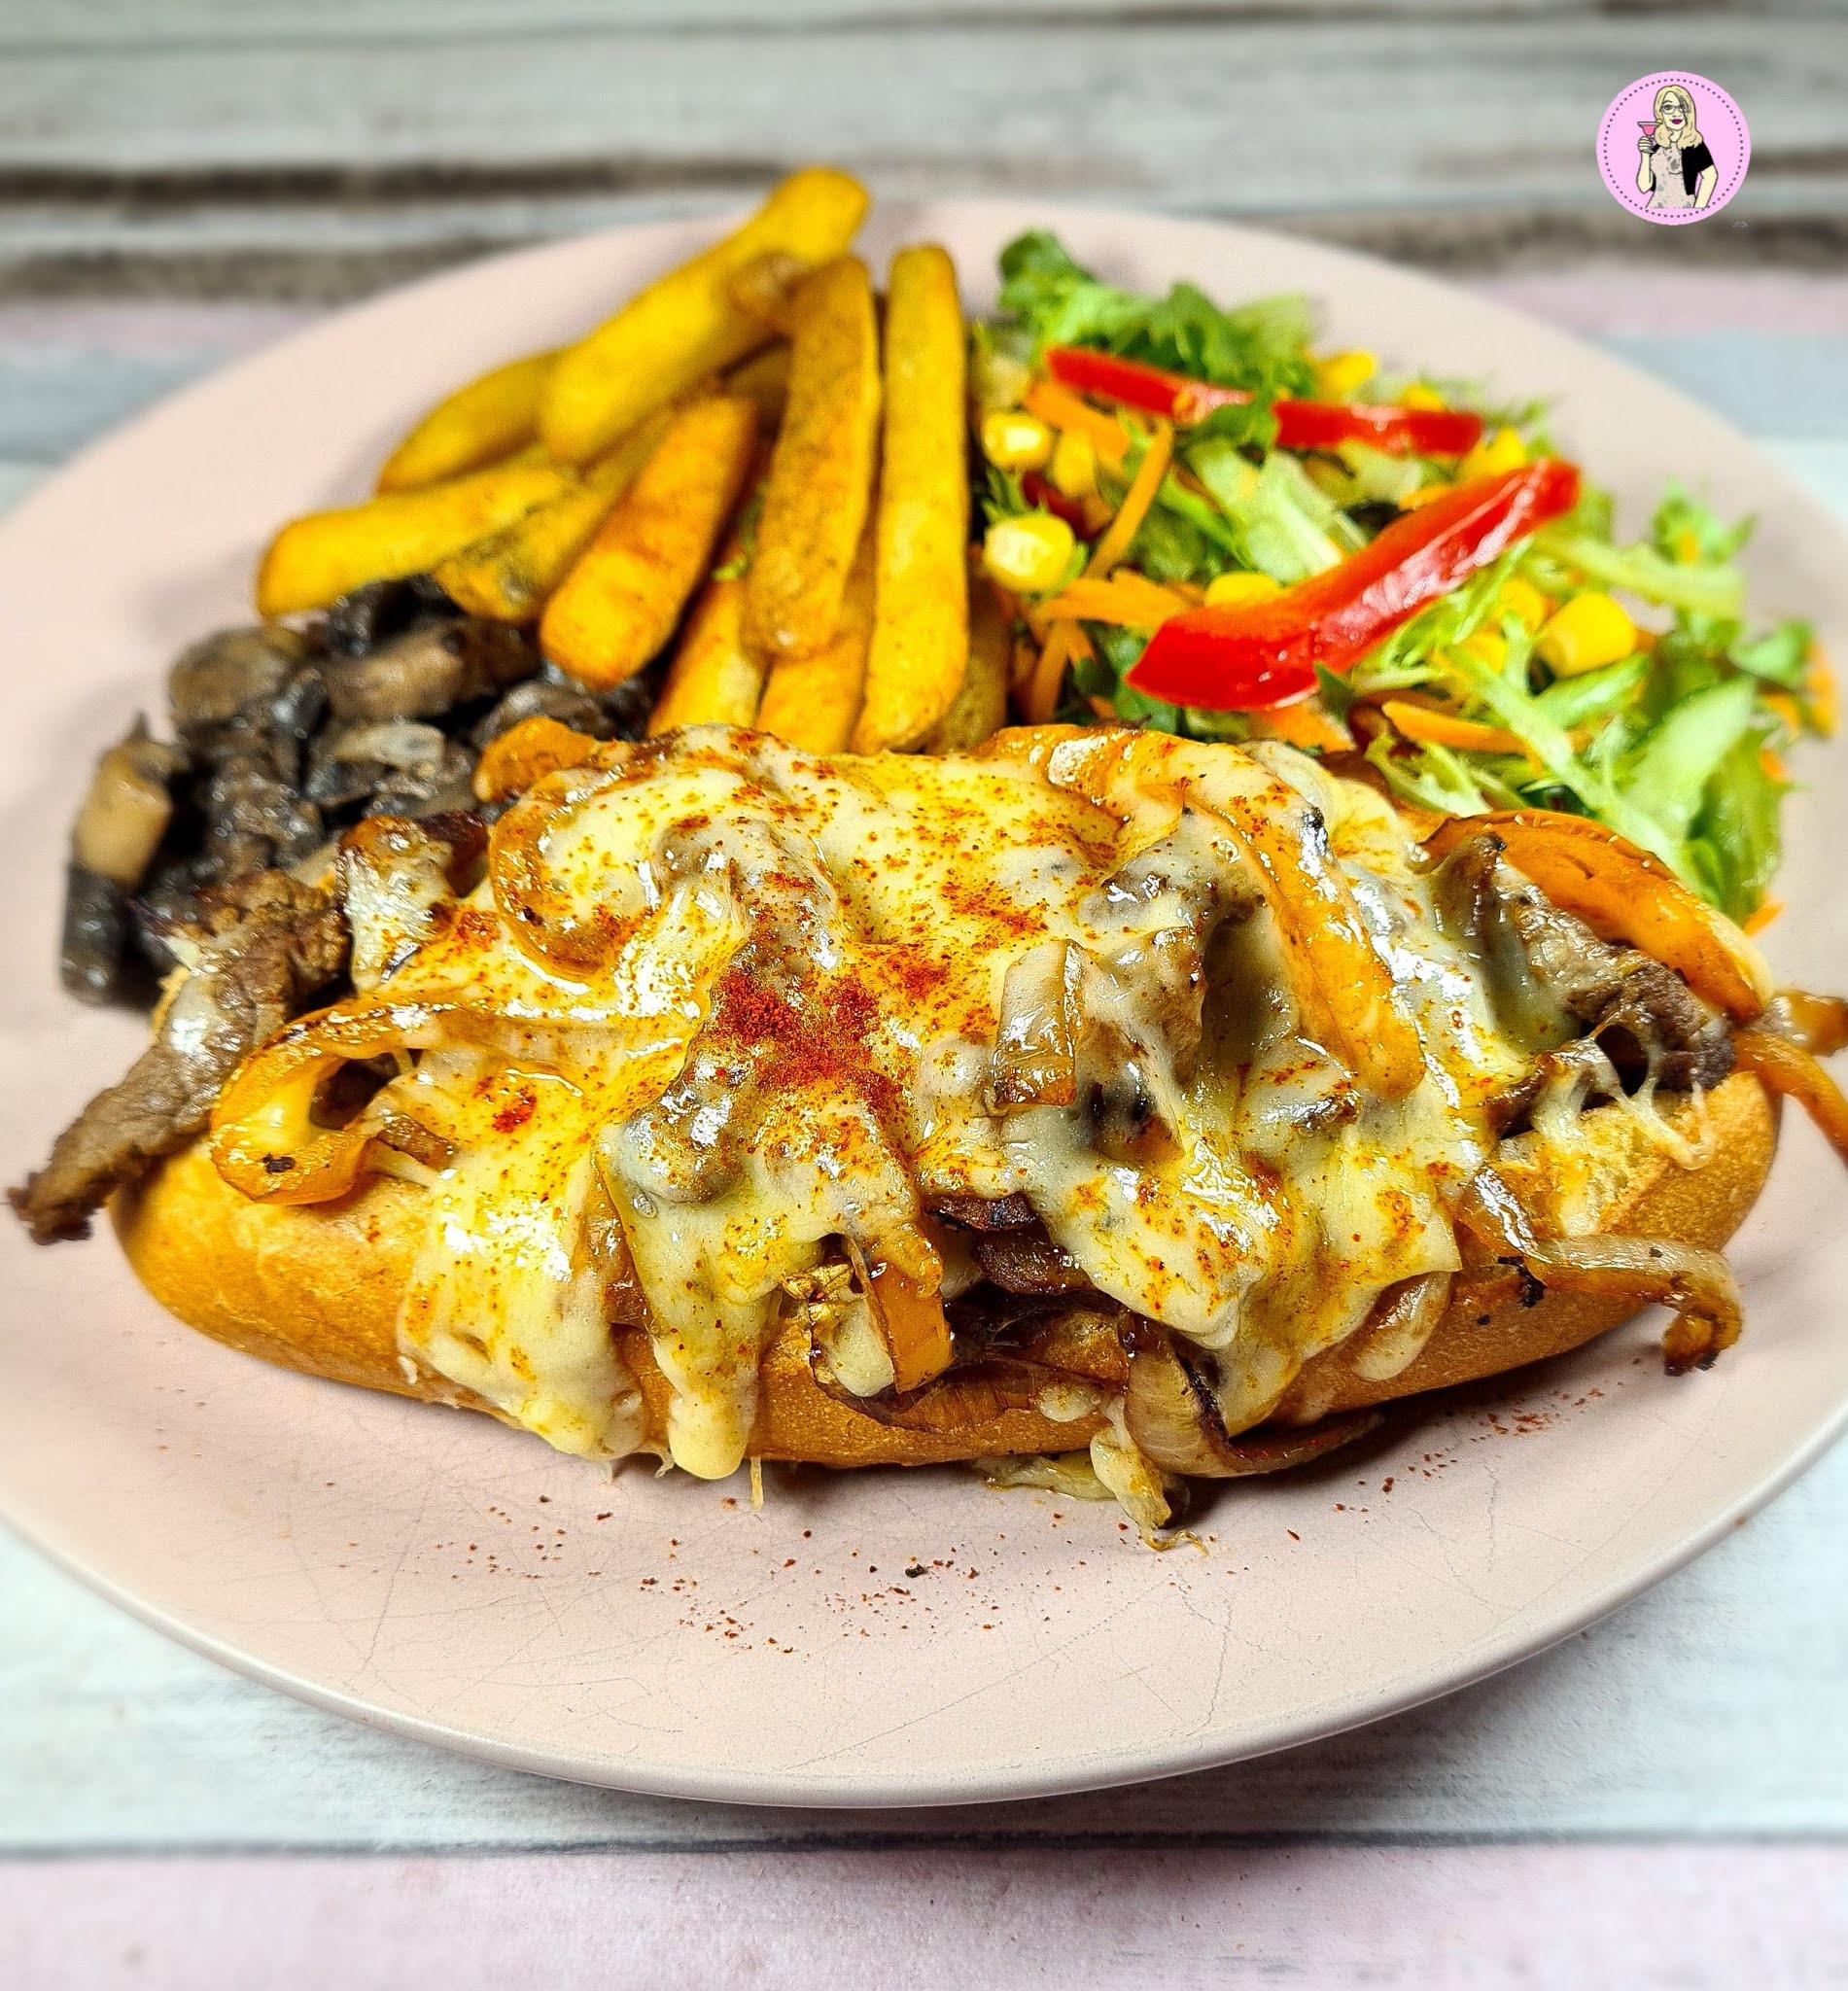 Philly Cheesesteak Sandwich Recipe | Slimming Friendly